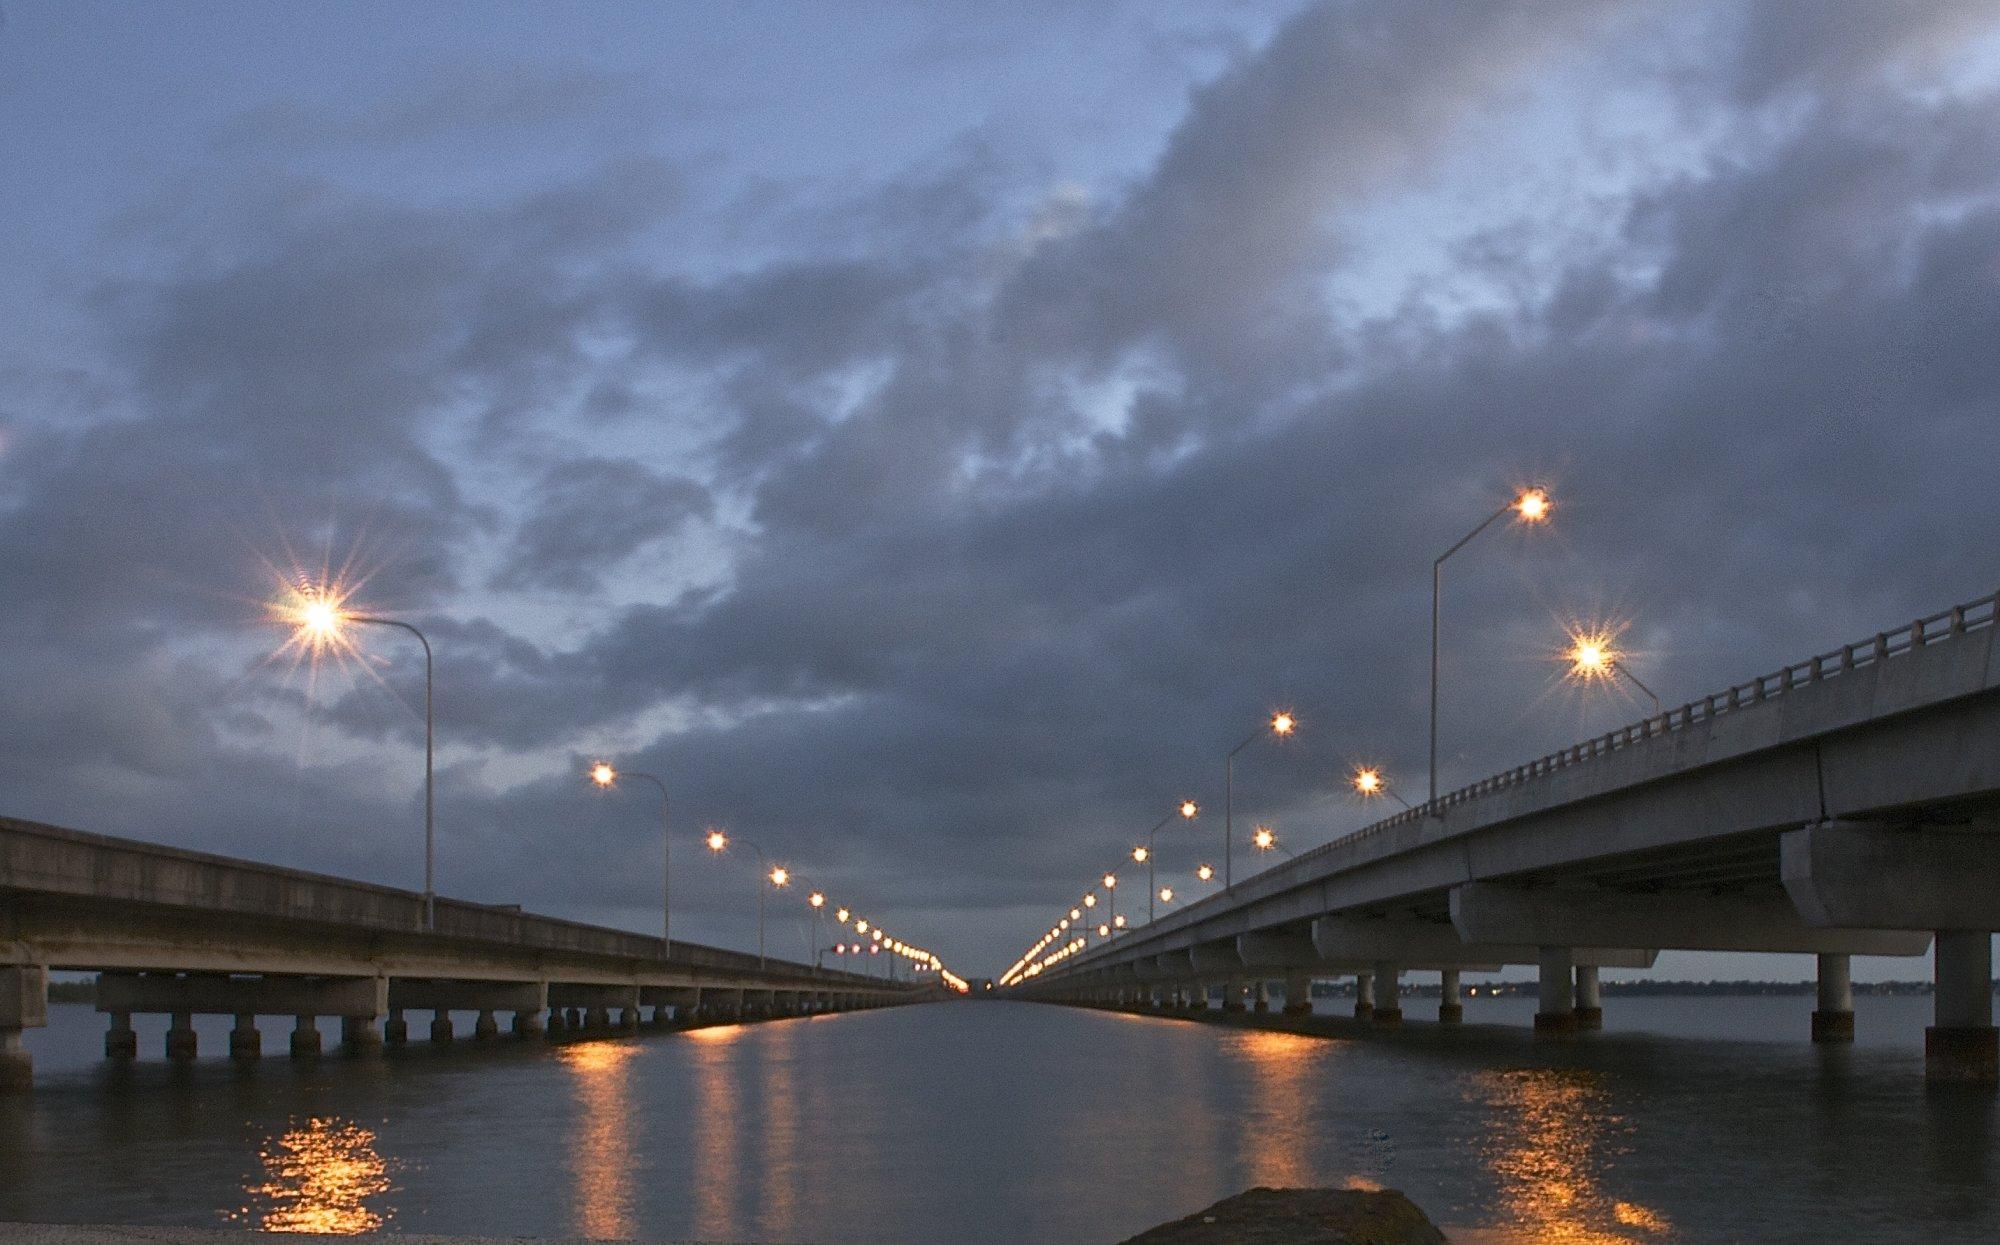 Hornibrook Bridge